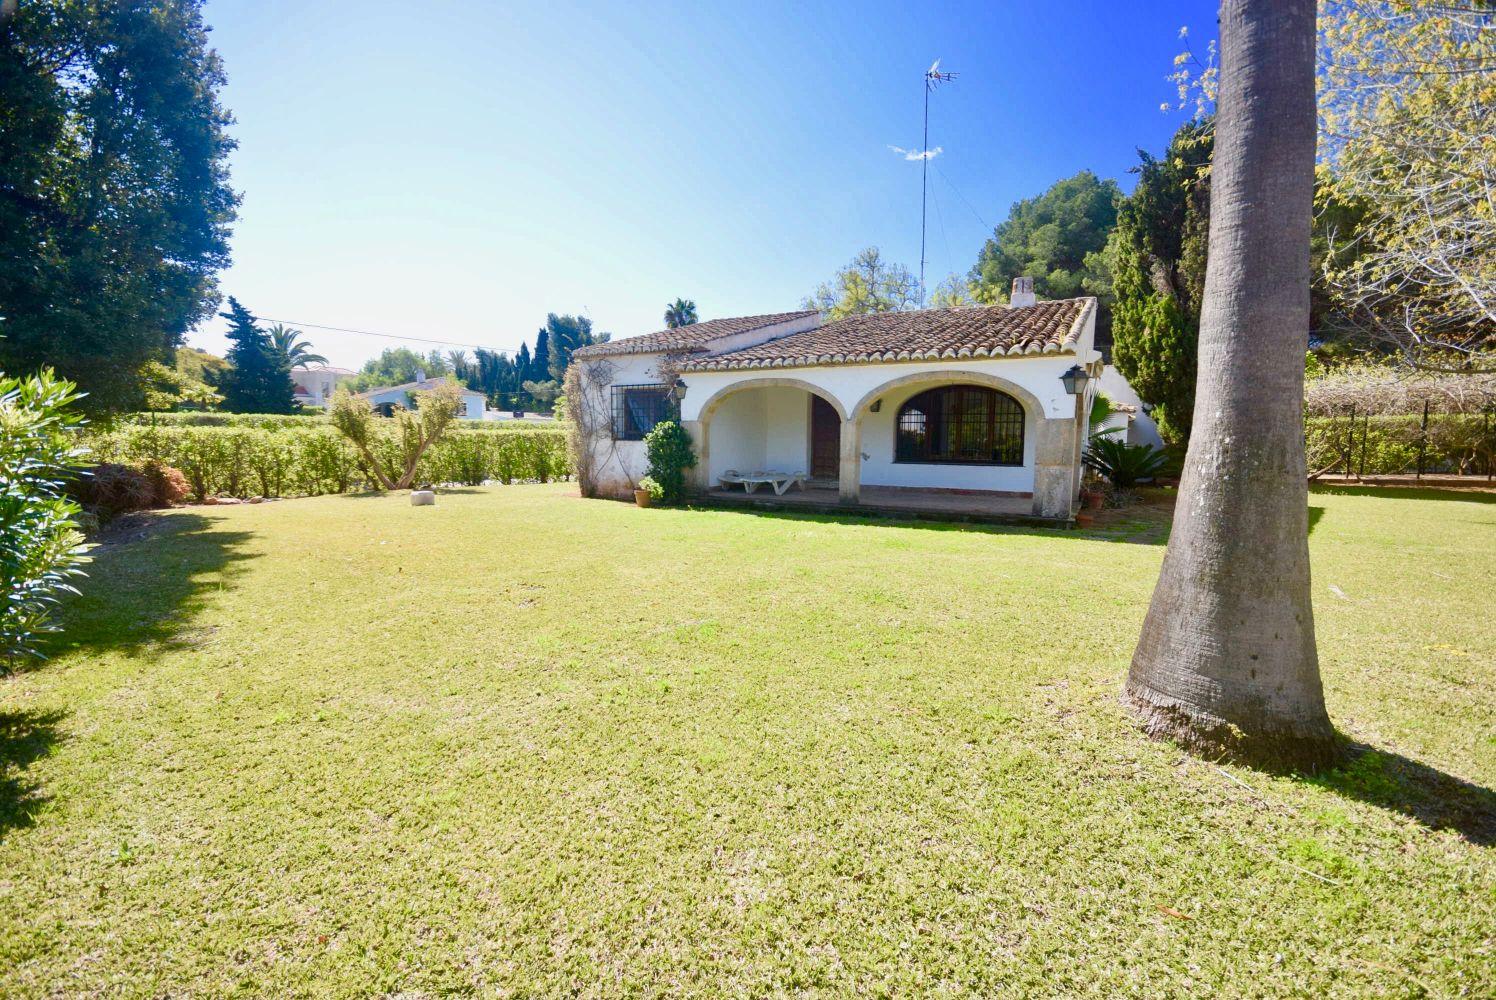 Villas for sale in Toscal Javea